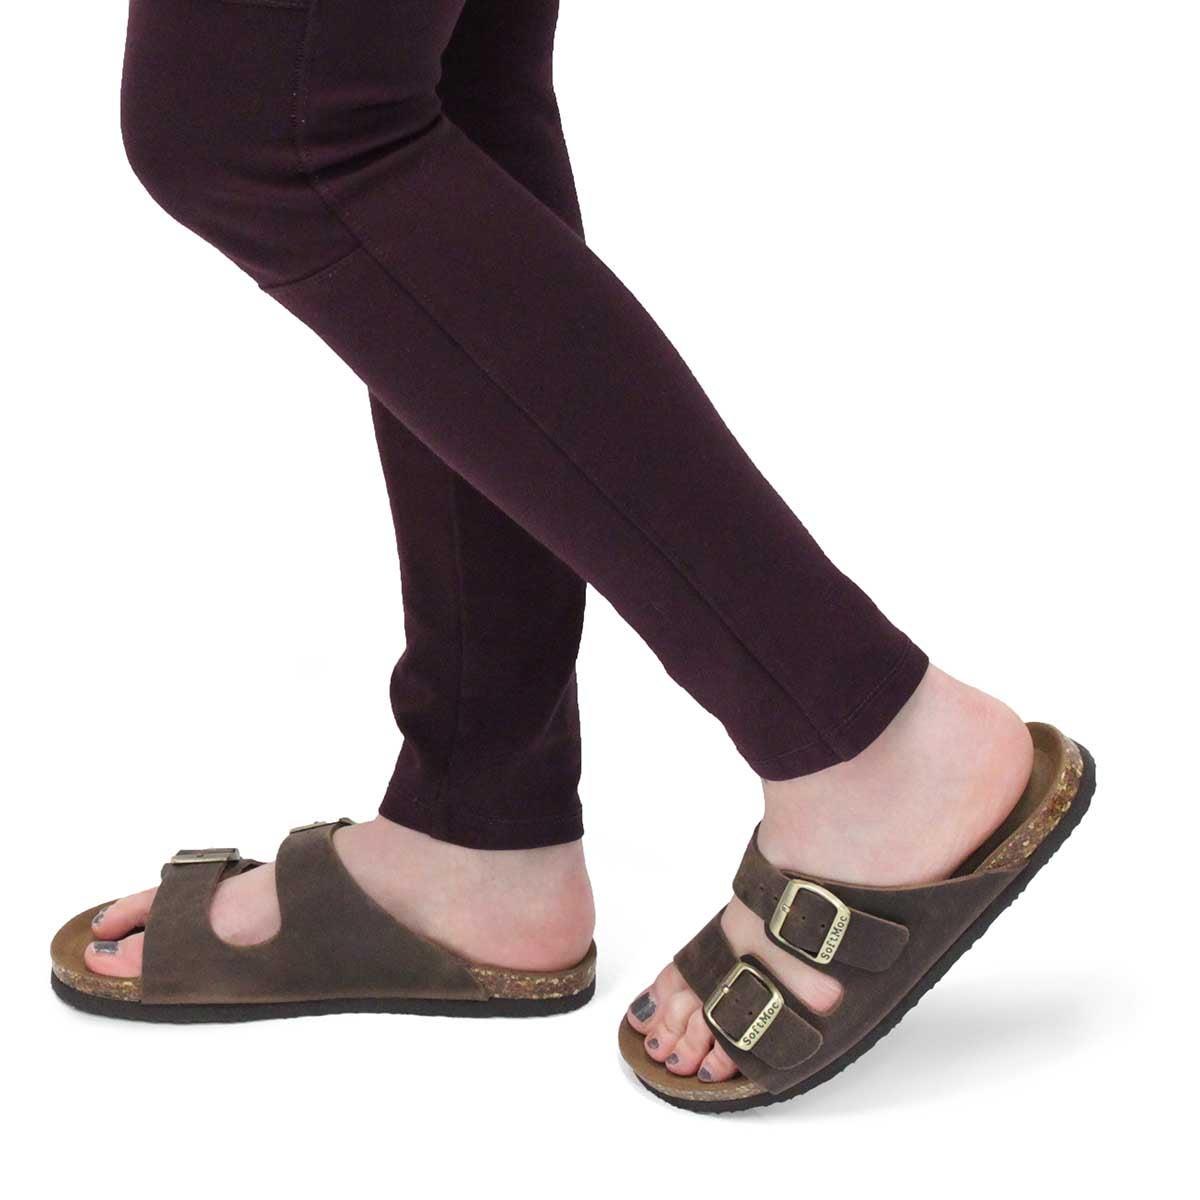 Lds Anna Slim brown slide sandal